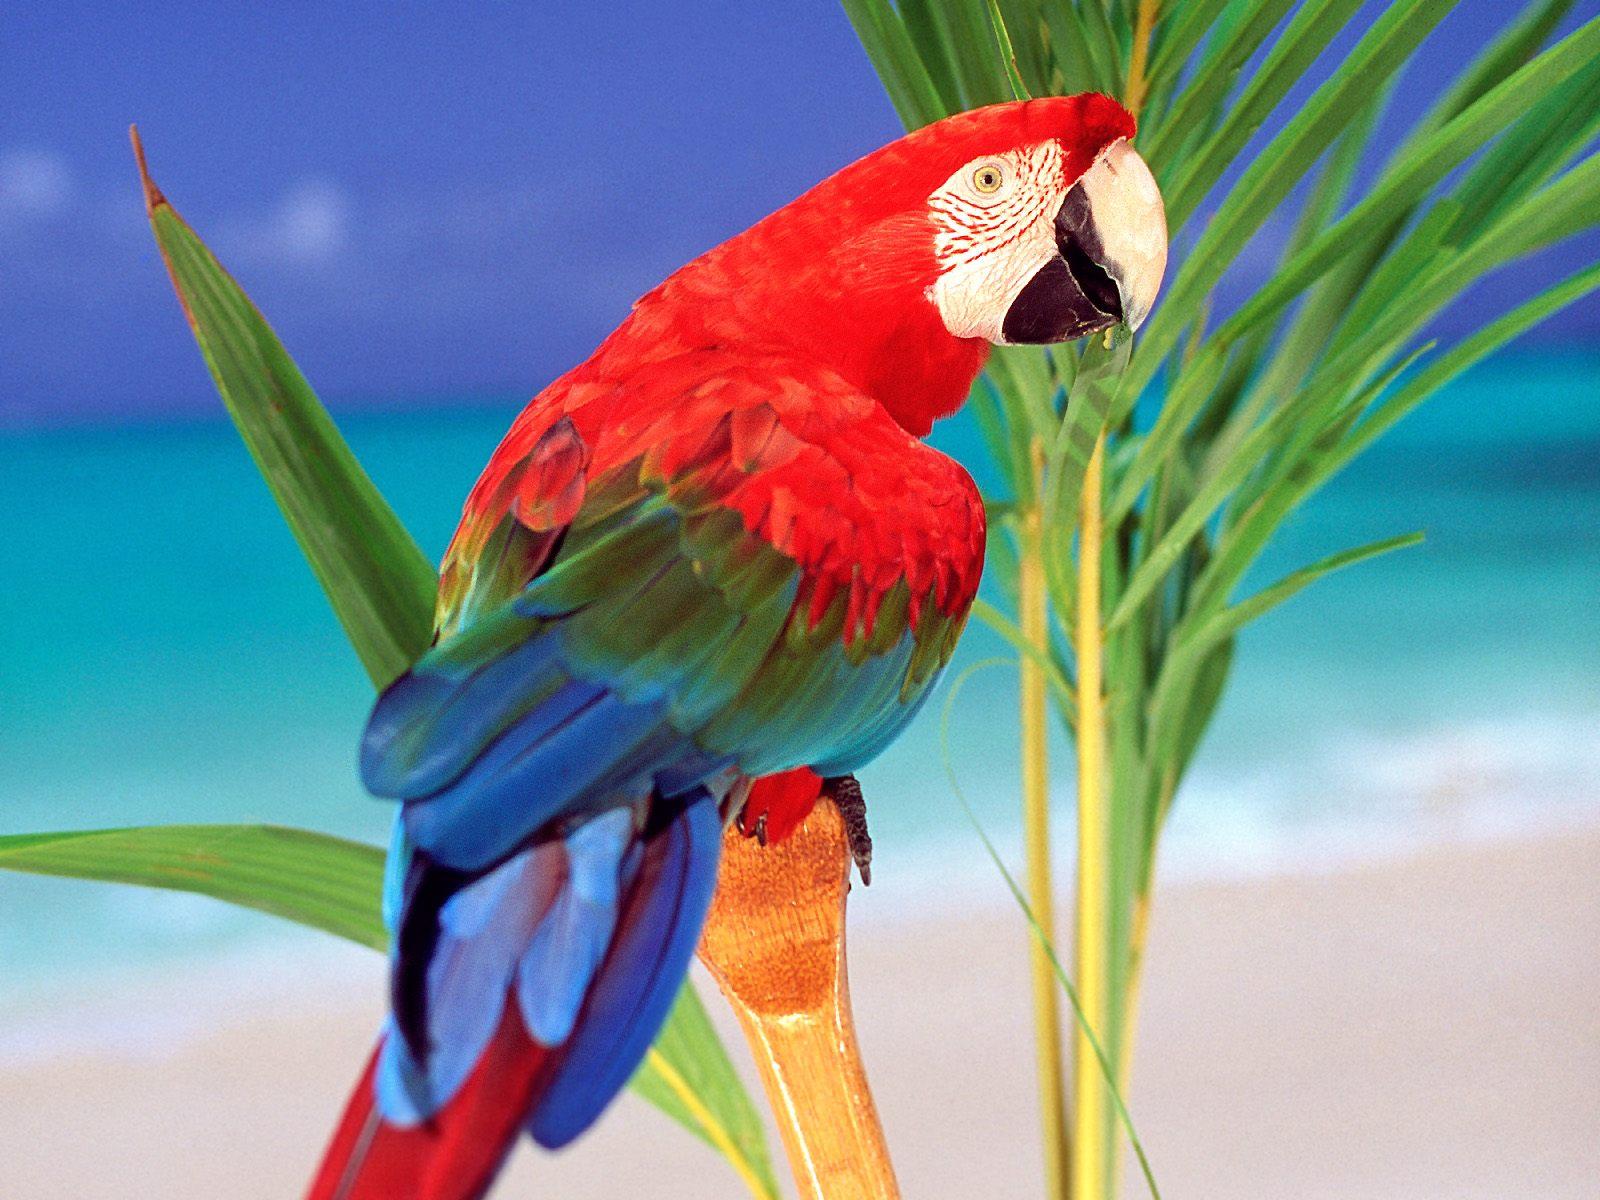 Parrot Picture   Wide 1600 x 1200 Hd Desktop Wallpaper 1600x1200